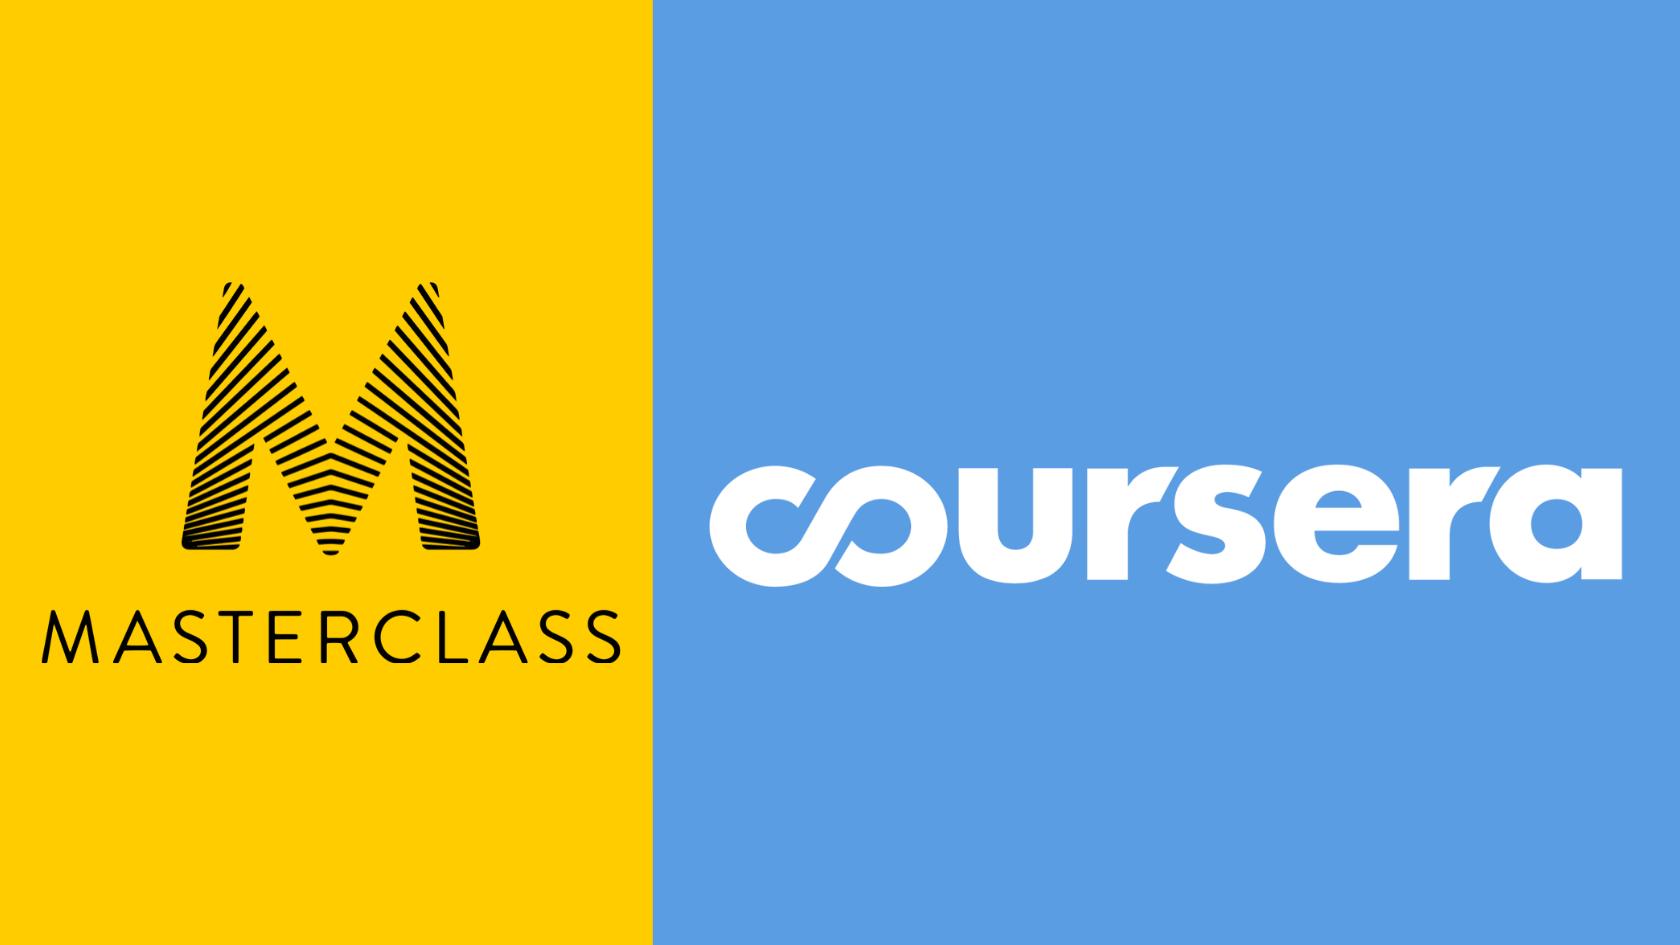 大师班vs Coursera